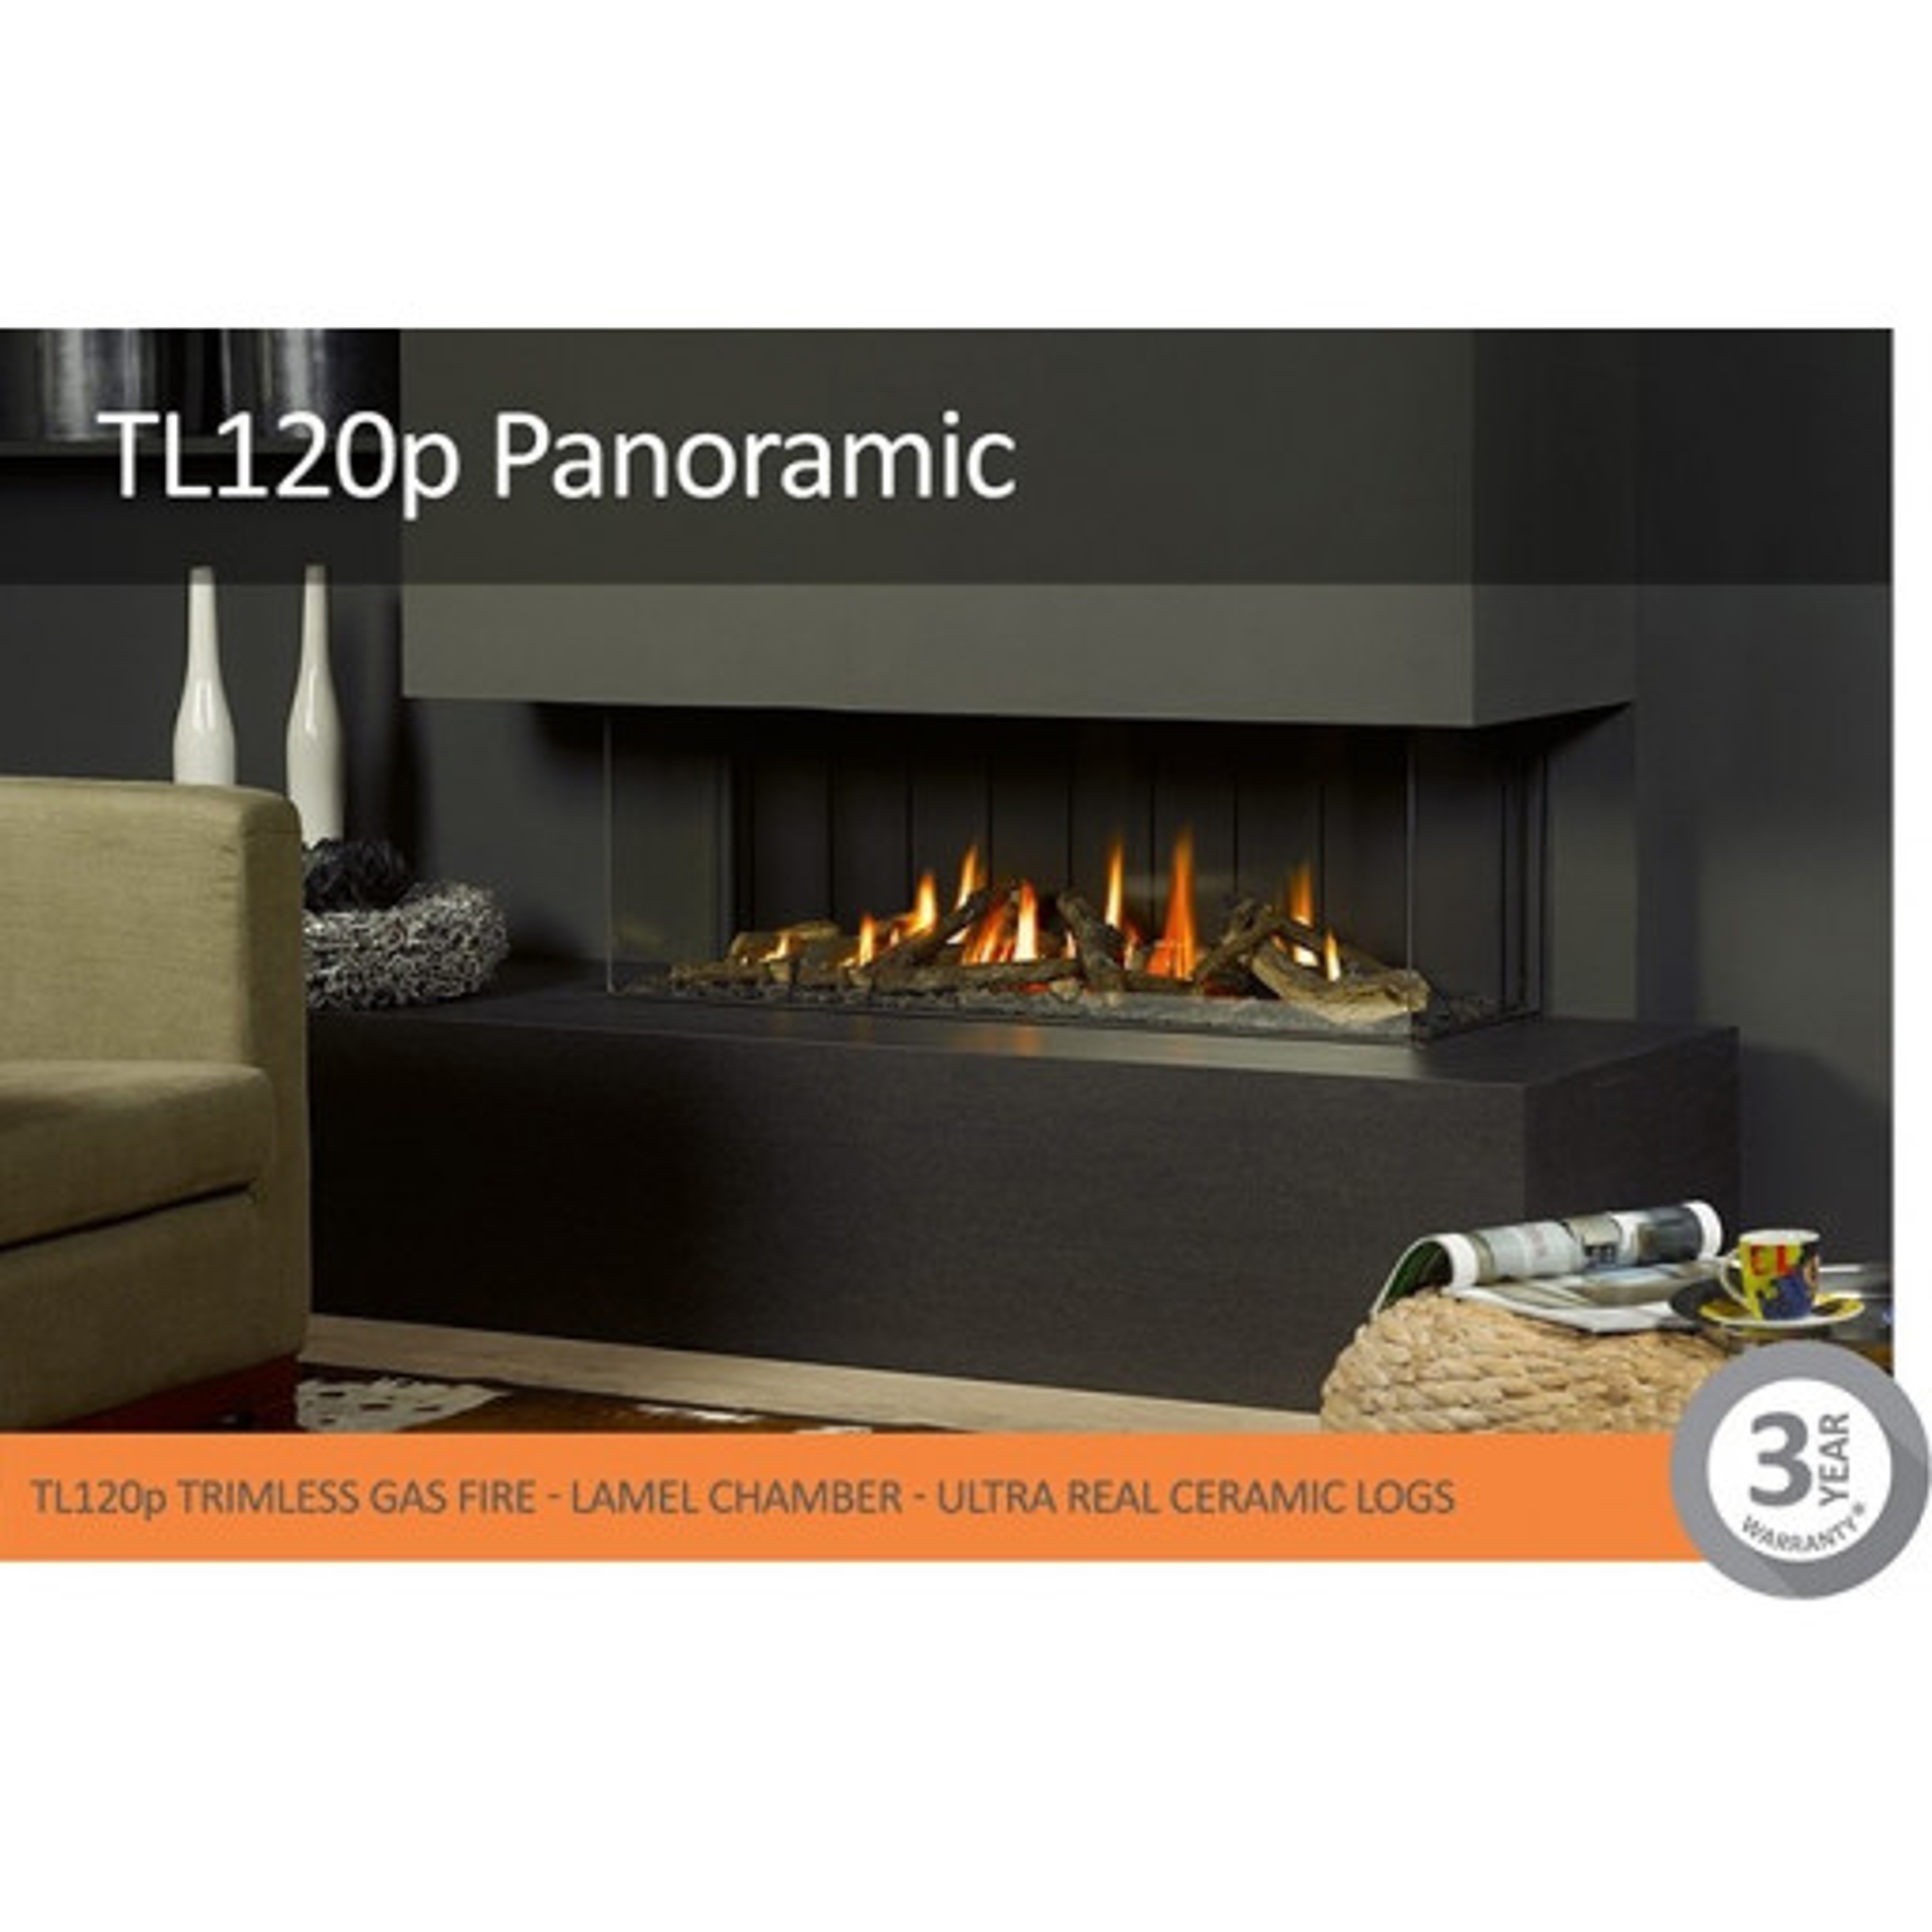 Vision Trimline TL120P Panoramic